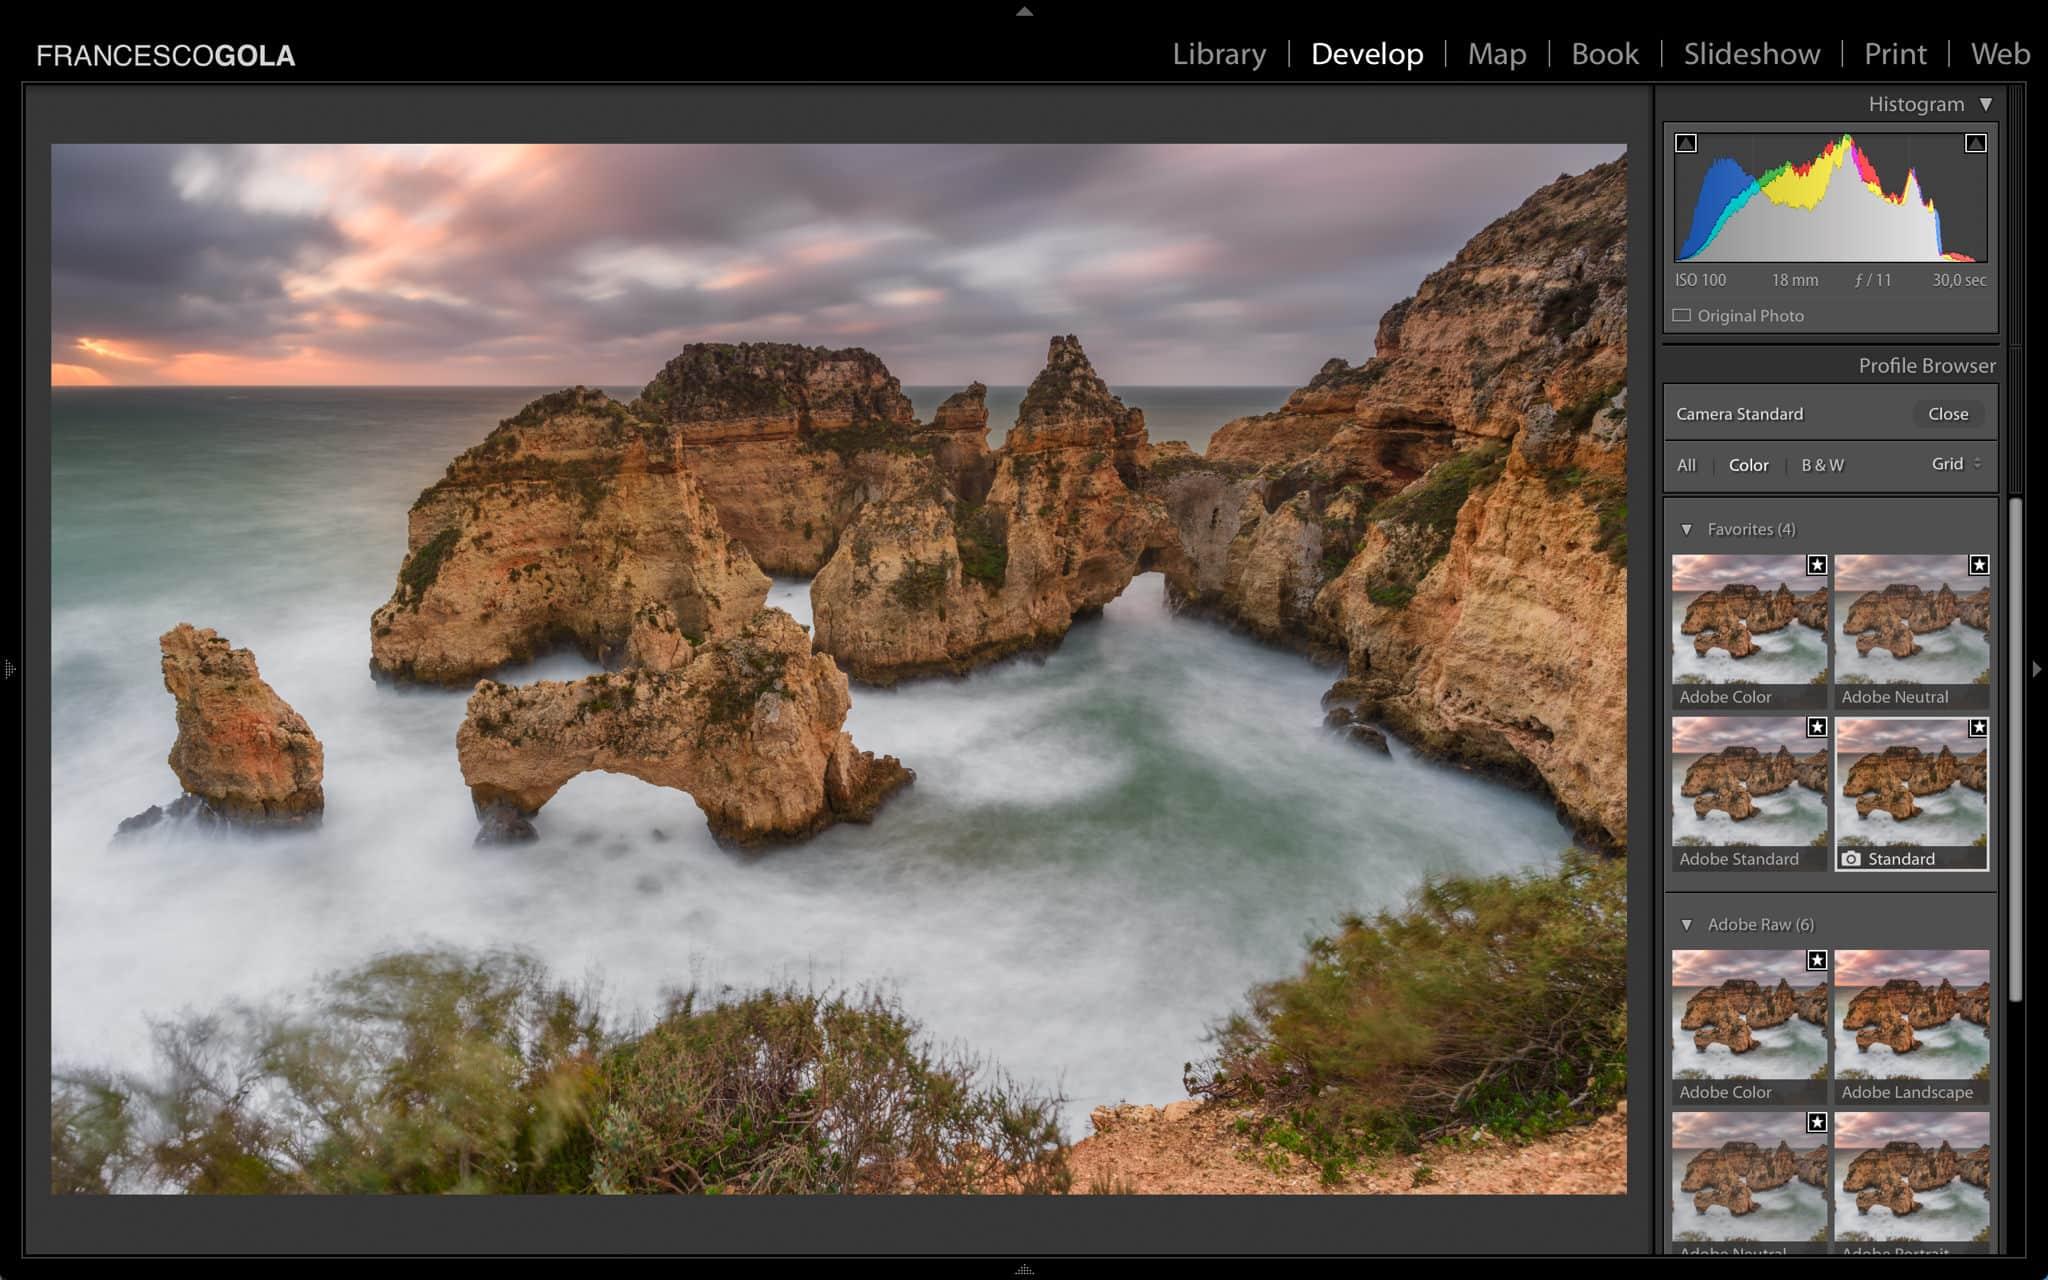 Update-Profiles-Adobe-Francesco-Gola-Cover